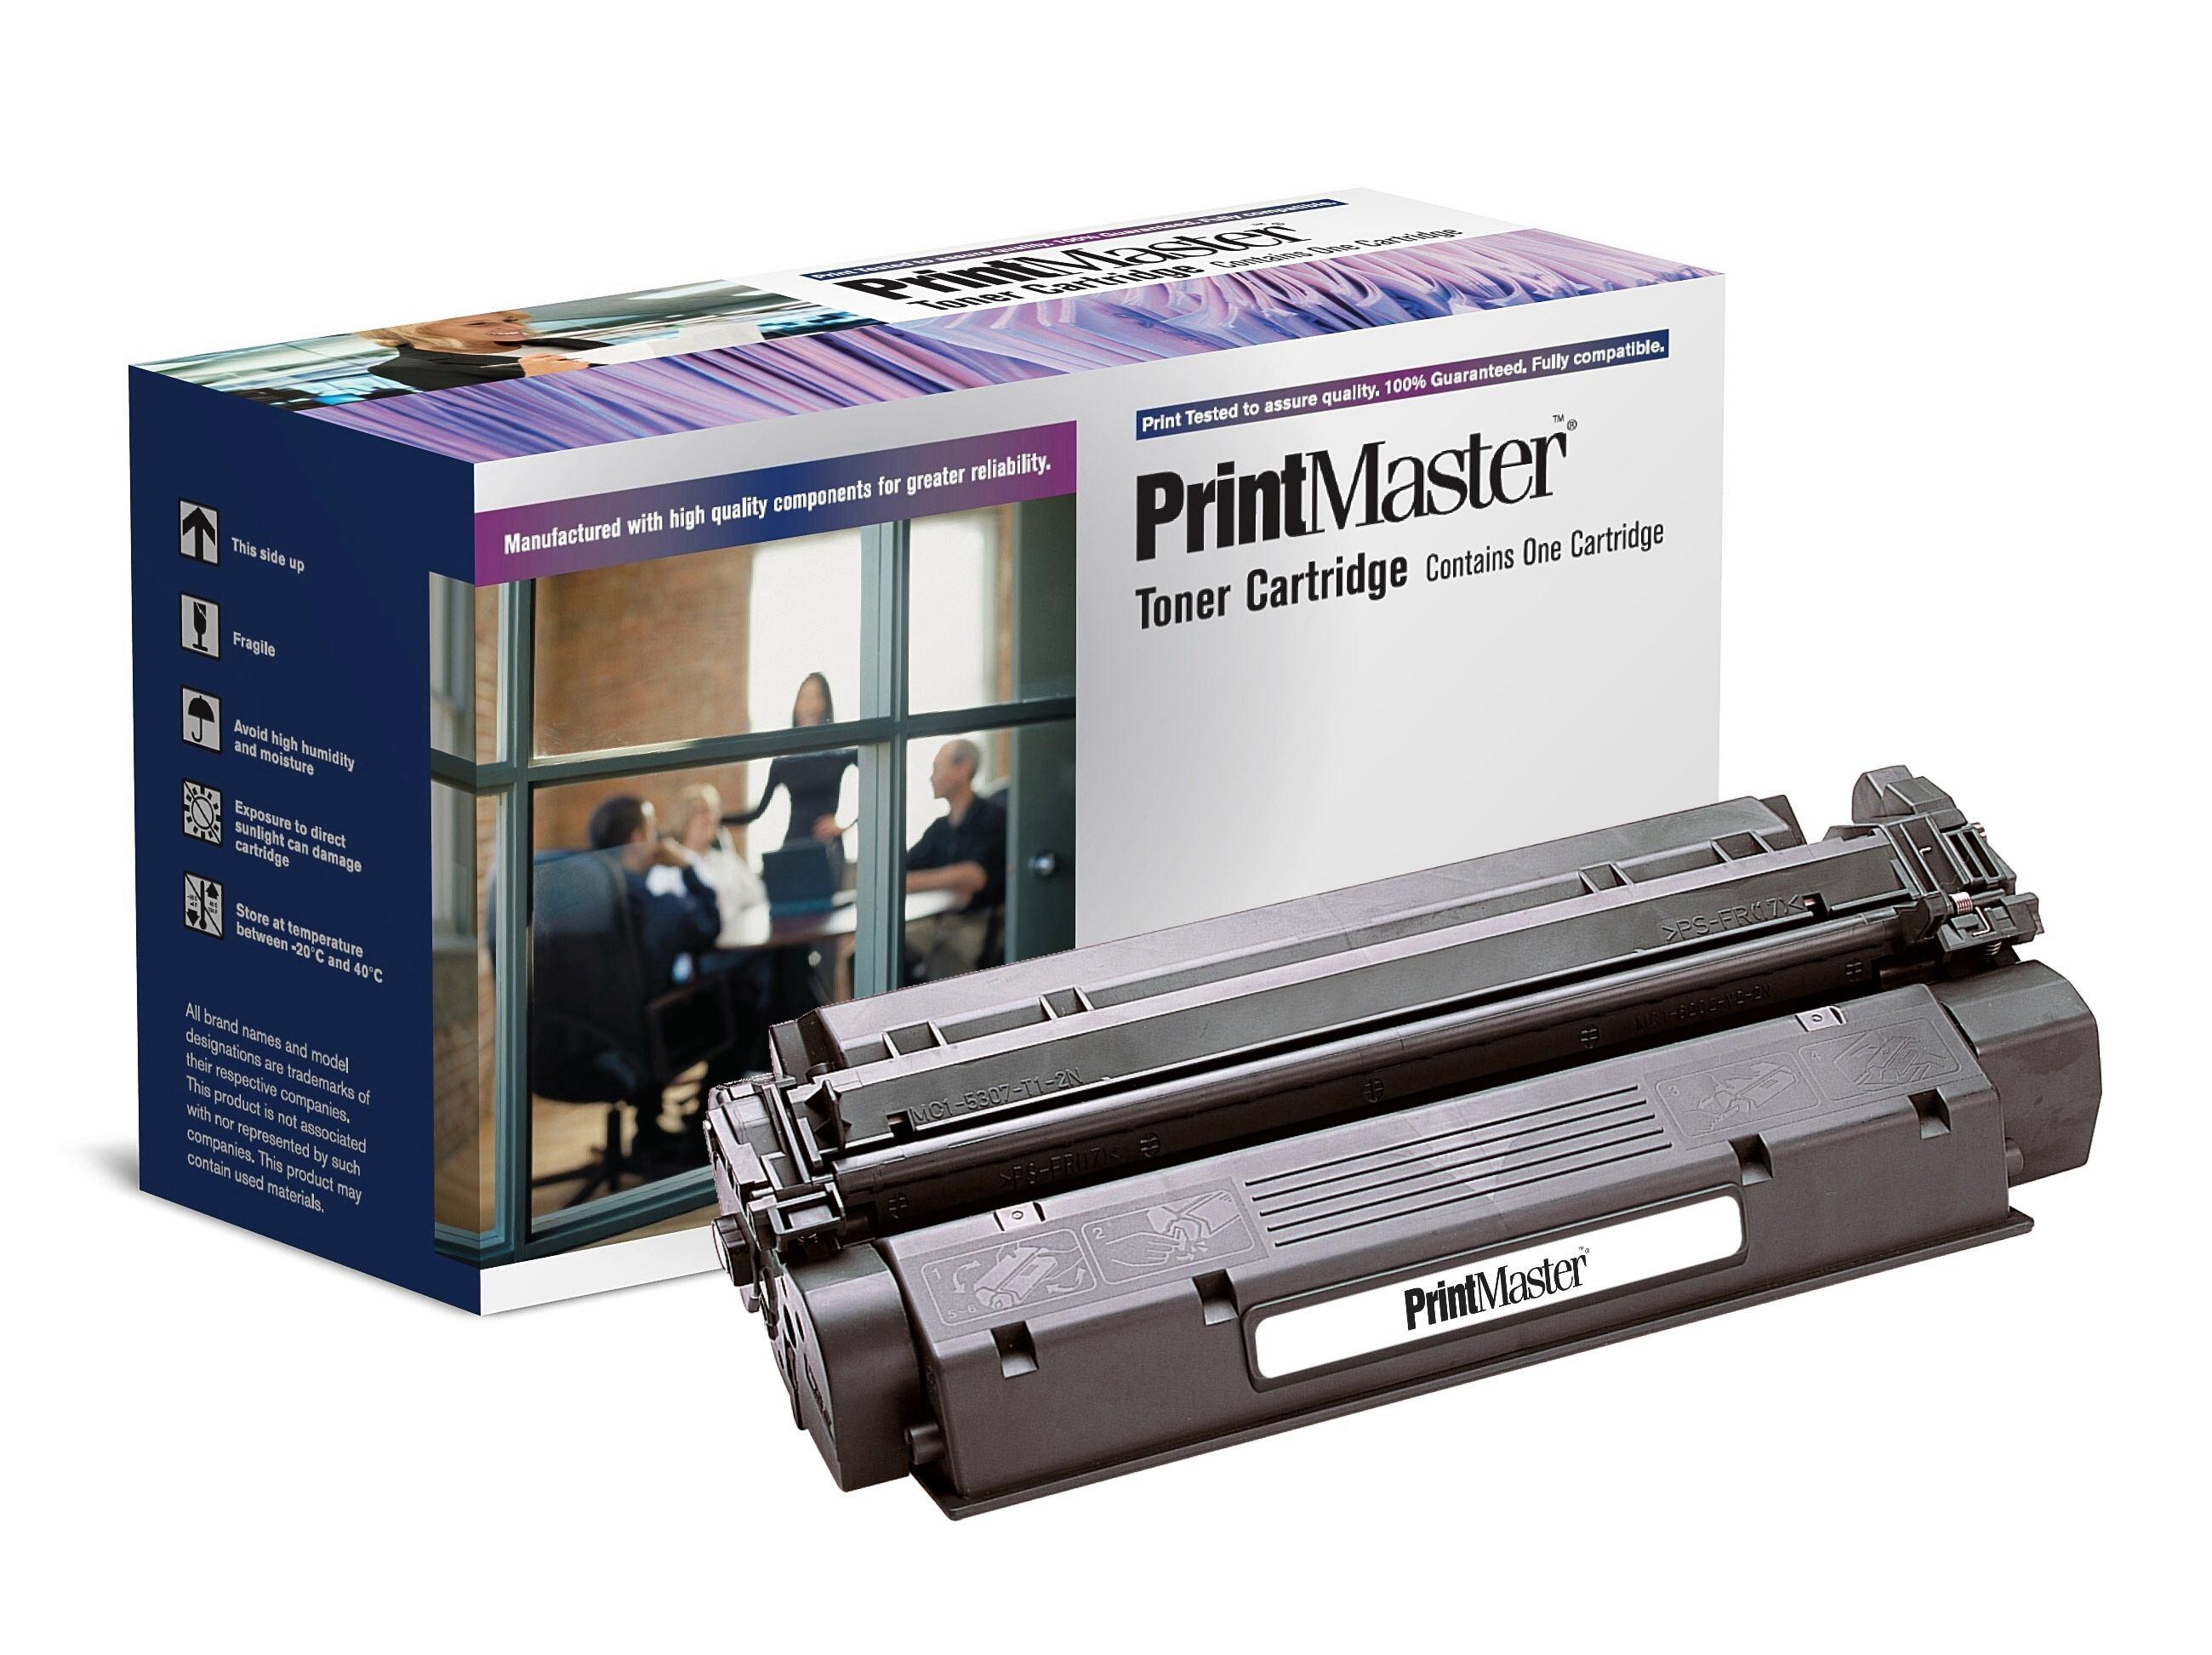 PrintMaster HP LJ 1200/3320/30 Bk C7115X